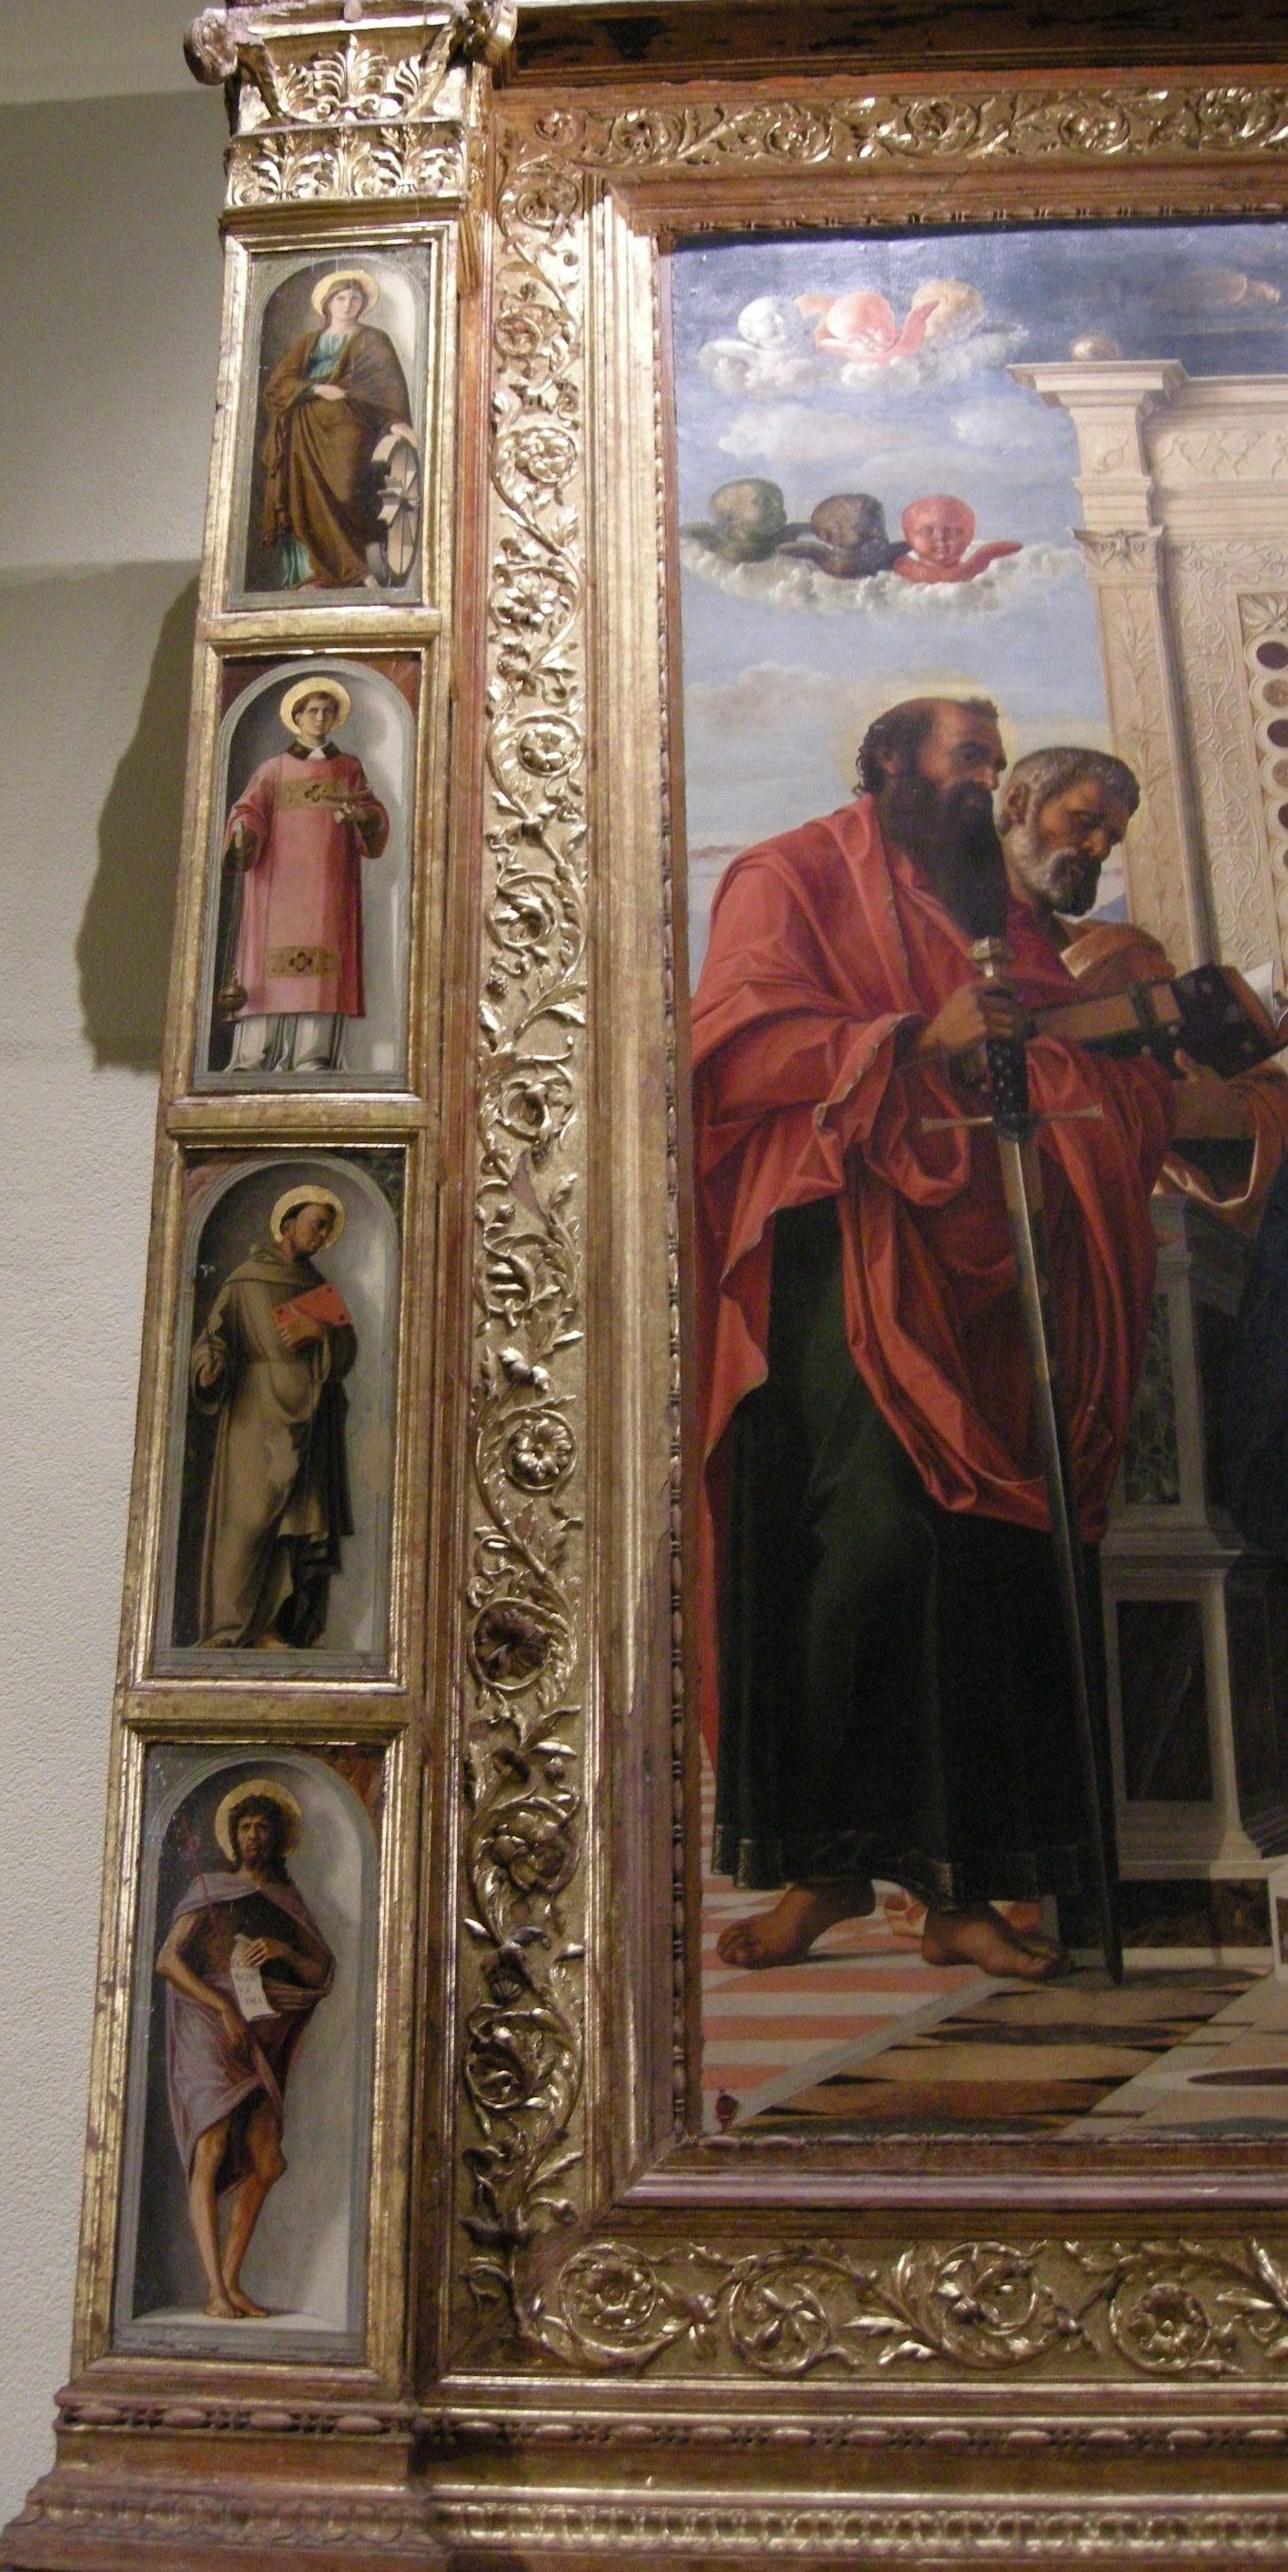 Беллини. Фрагмент Алтарь Пезаро. 1470-80. Пезаро, Городские музеи.